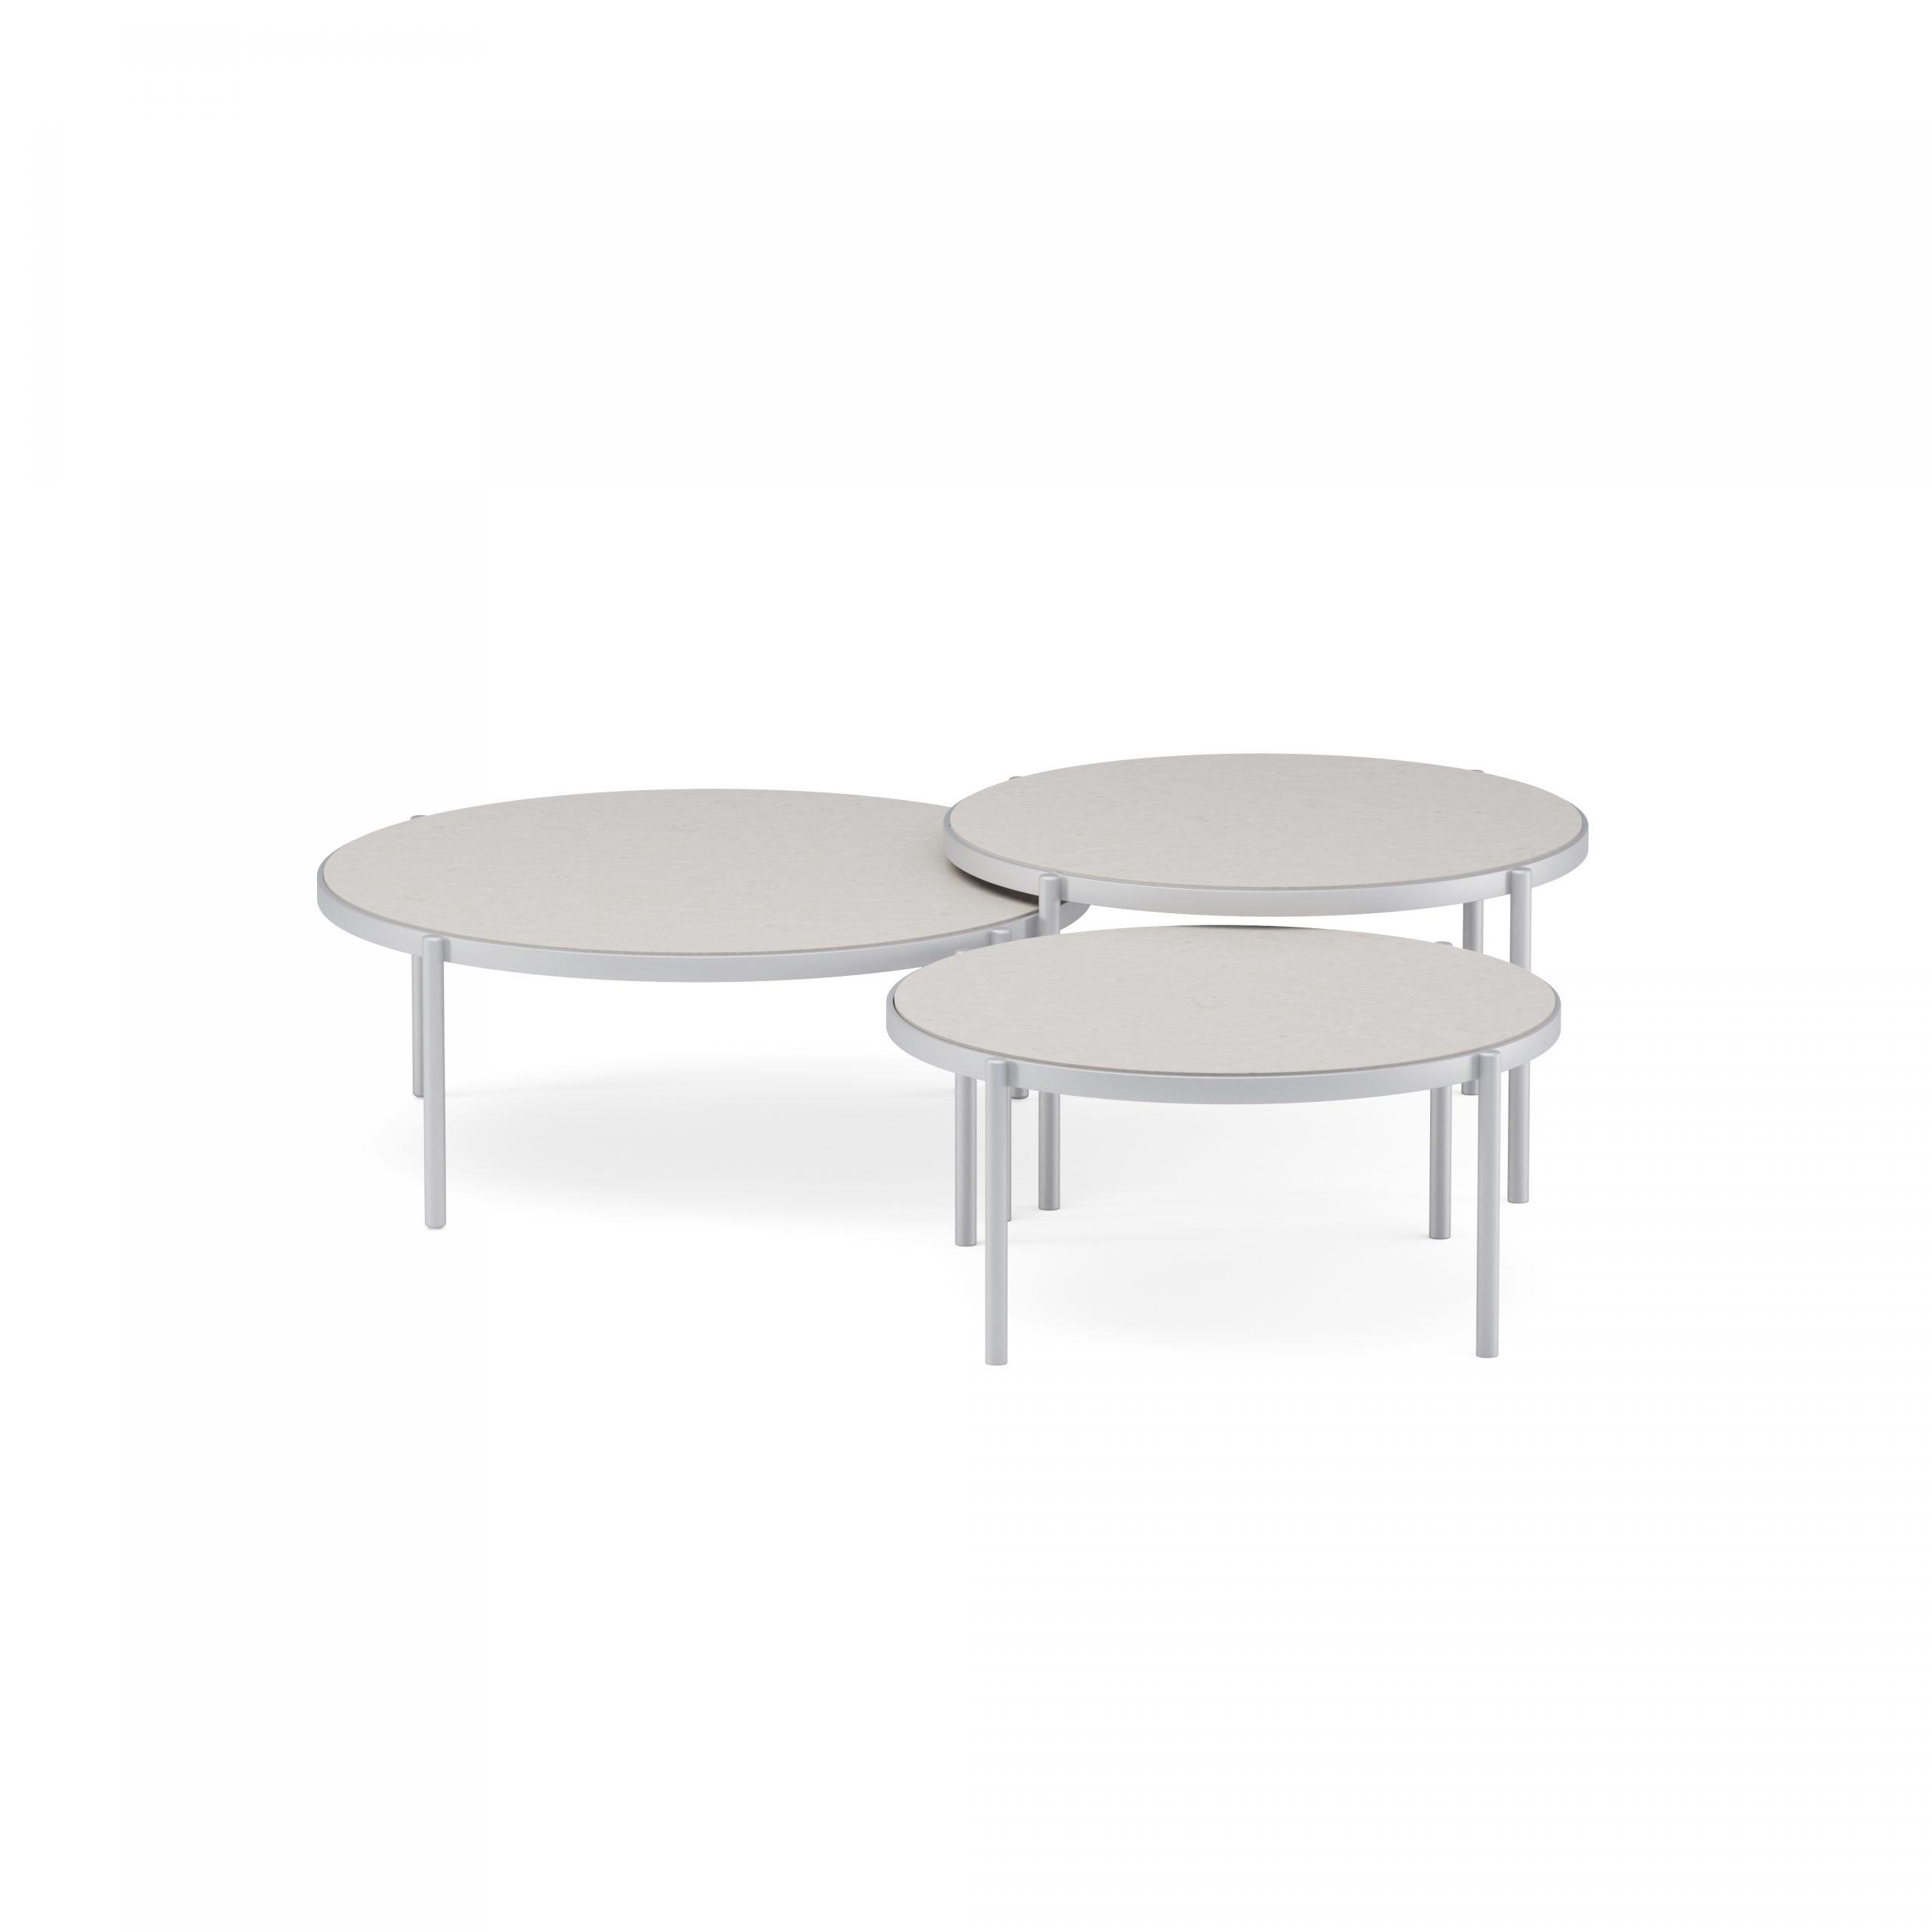 Jardinico tables